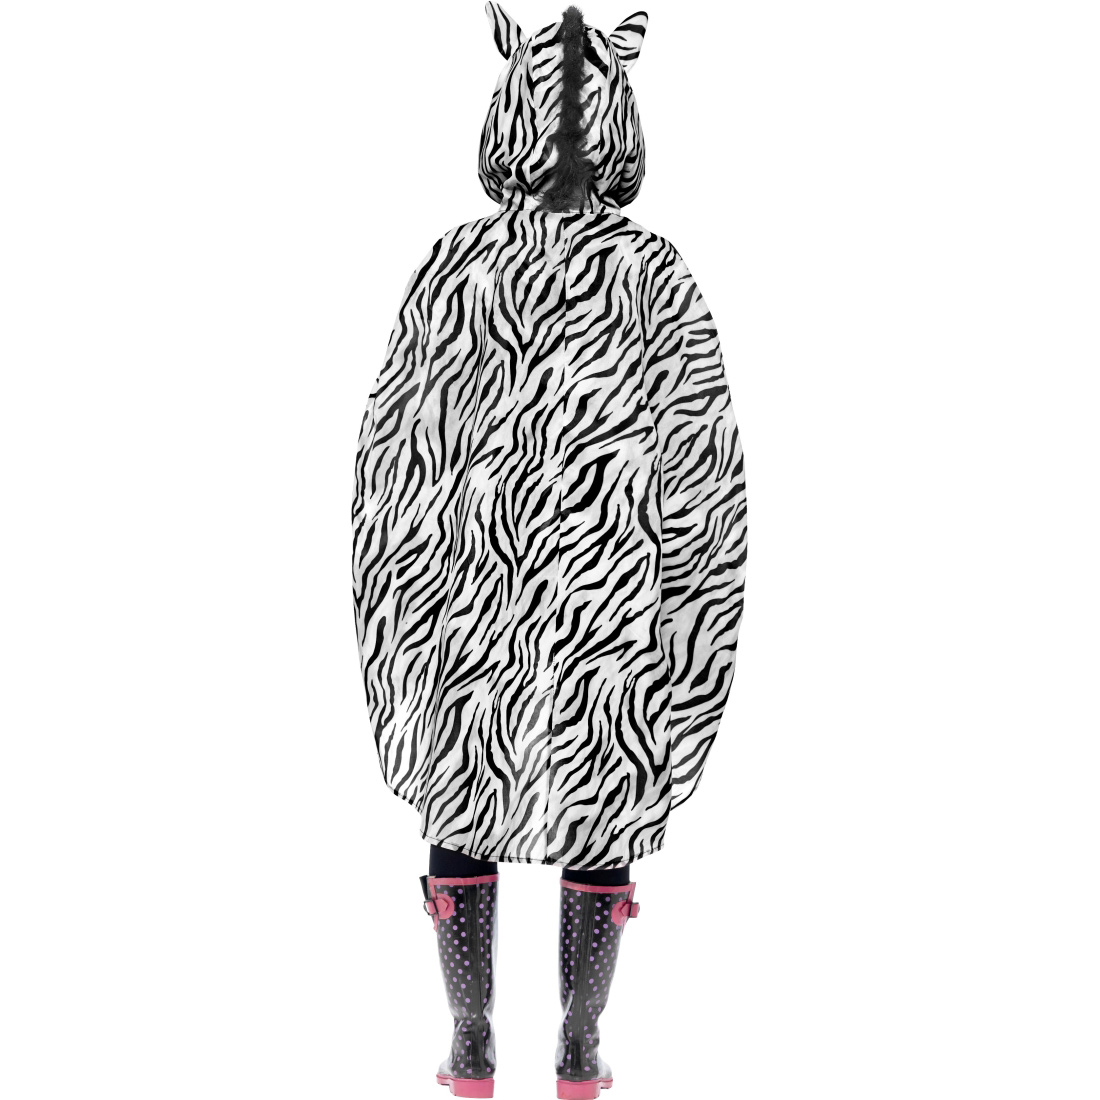 zebra party poncho partyponcho regenponcho cape regencape. Black Bedroom Furniture Sets. Home Design Ideas